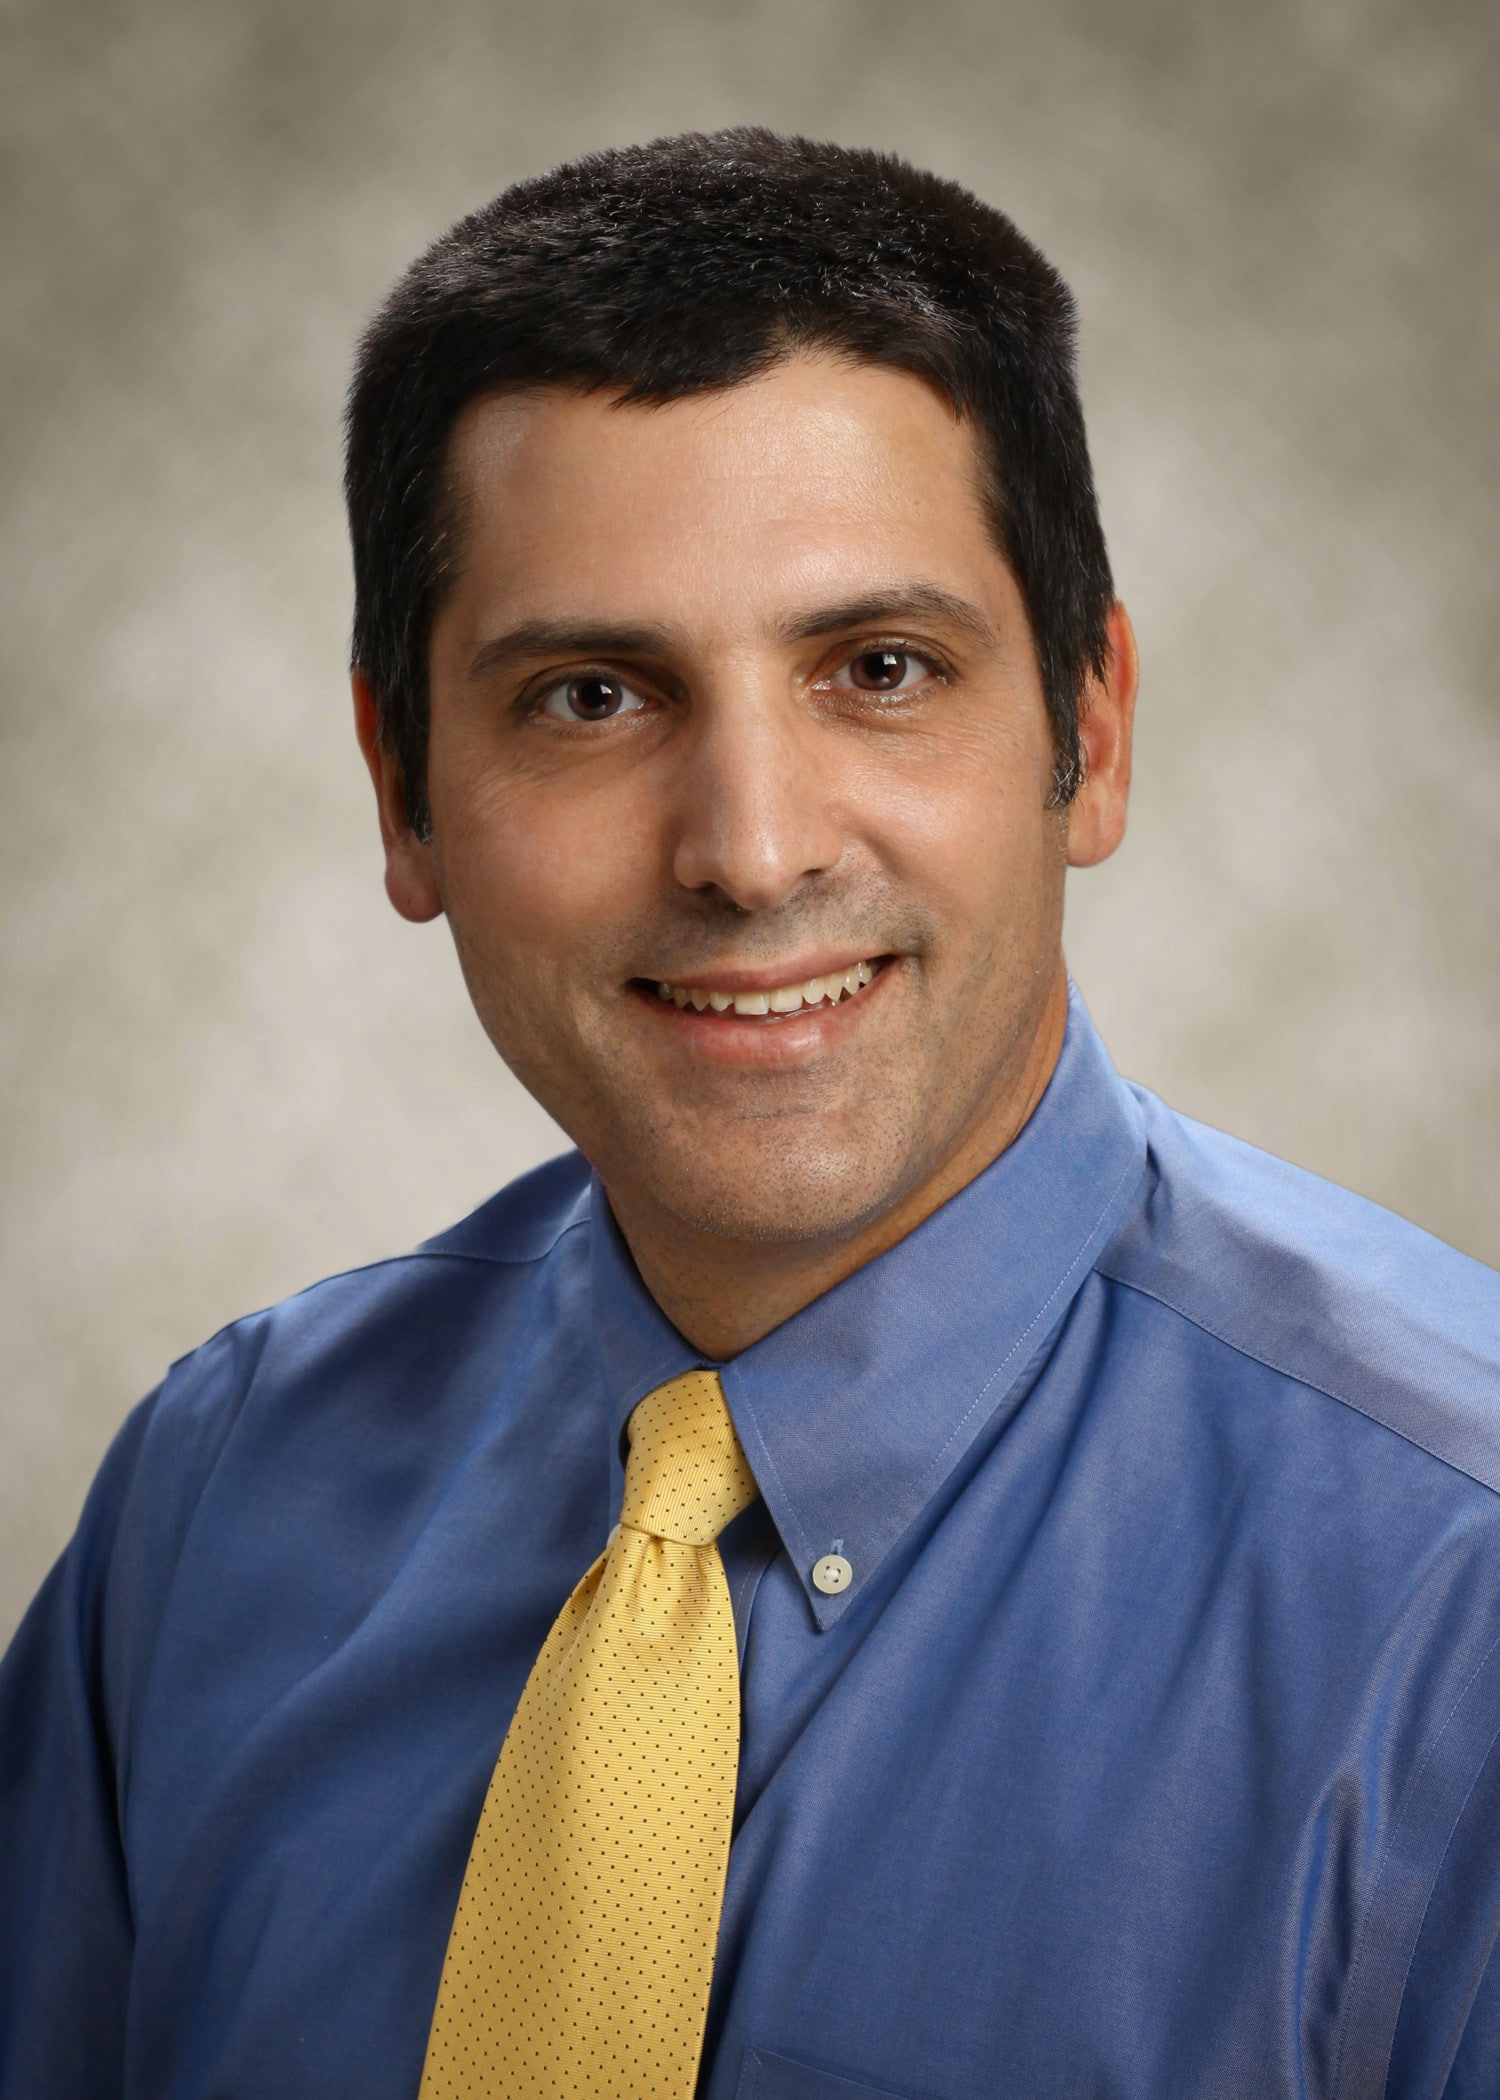 Spiro B Antoniades, MD Orthopaedic Surgery